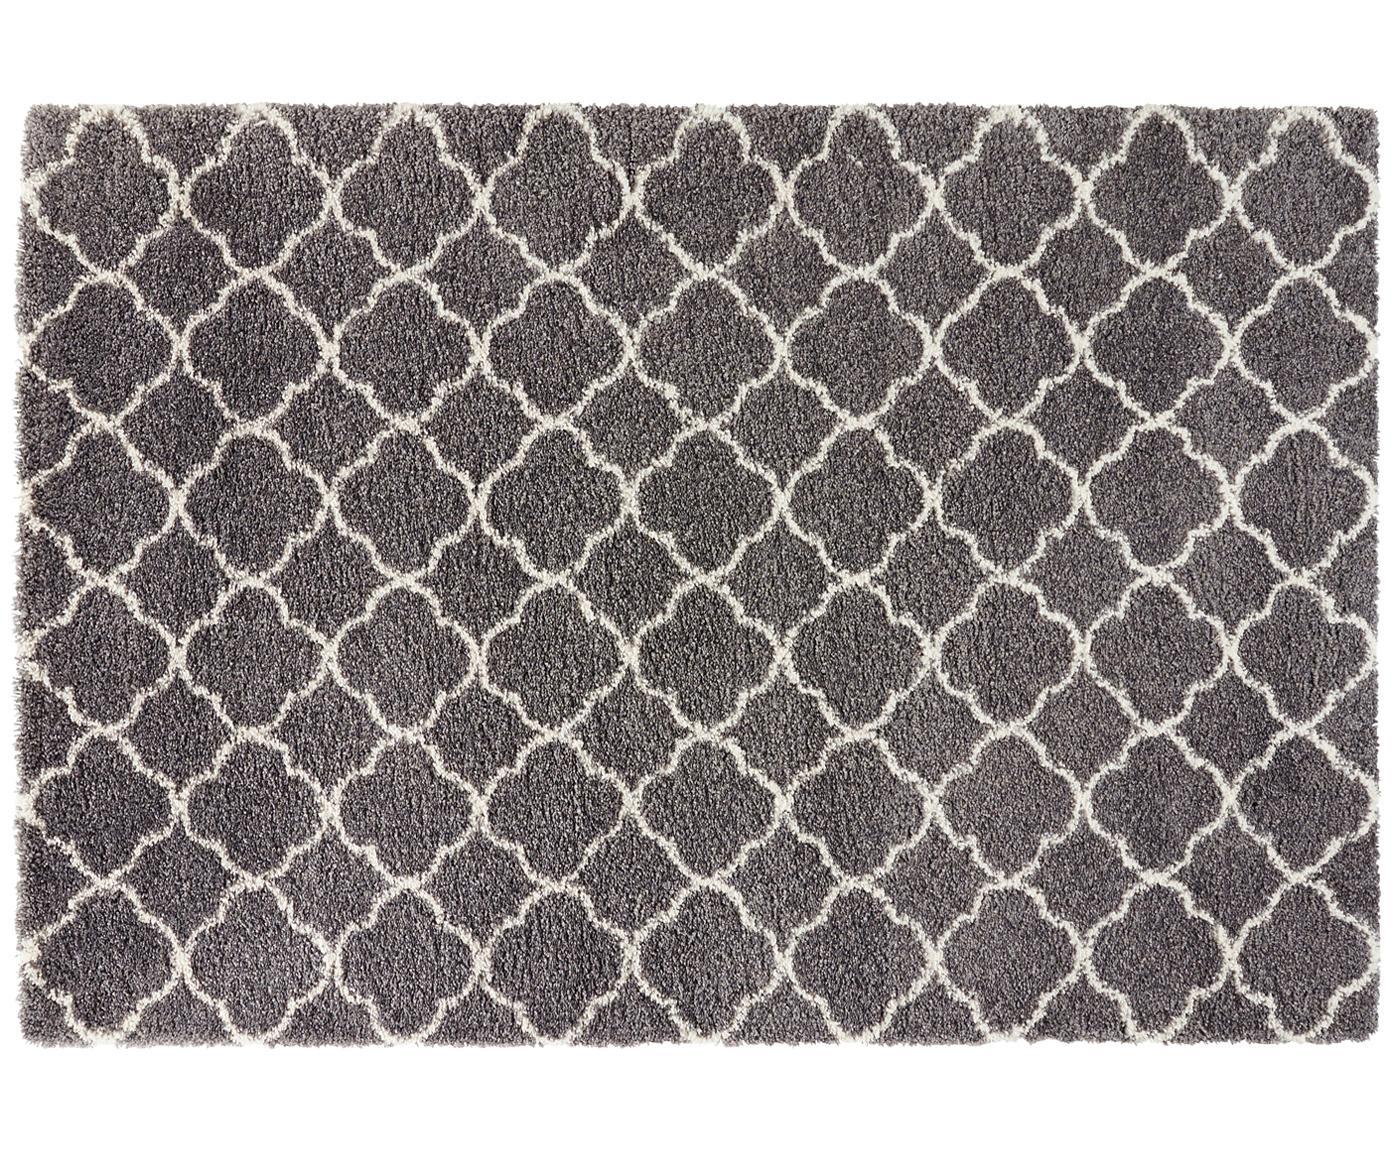 Hochflor-Teppich Grace in Dunkelgrau/Creme, Flor: 100% Polypropylen, Dunkelgrau, Creme, B 80 x L 150 cm (Grösse XS)